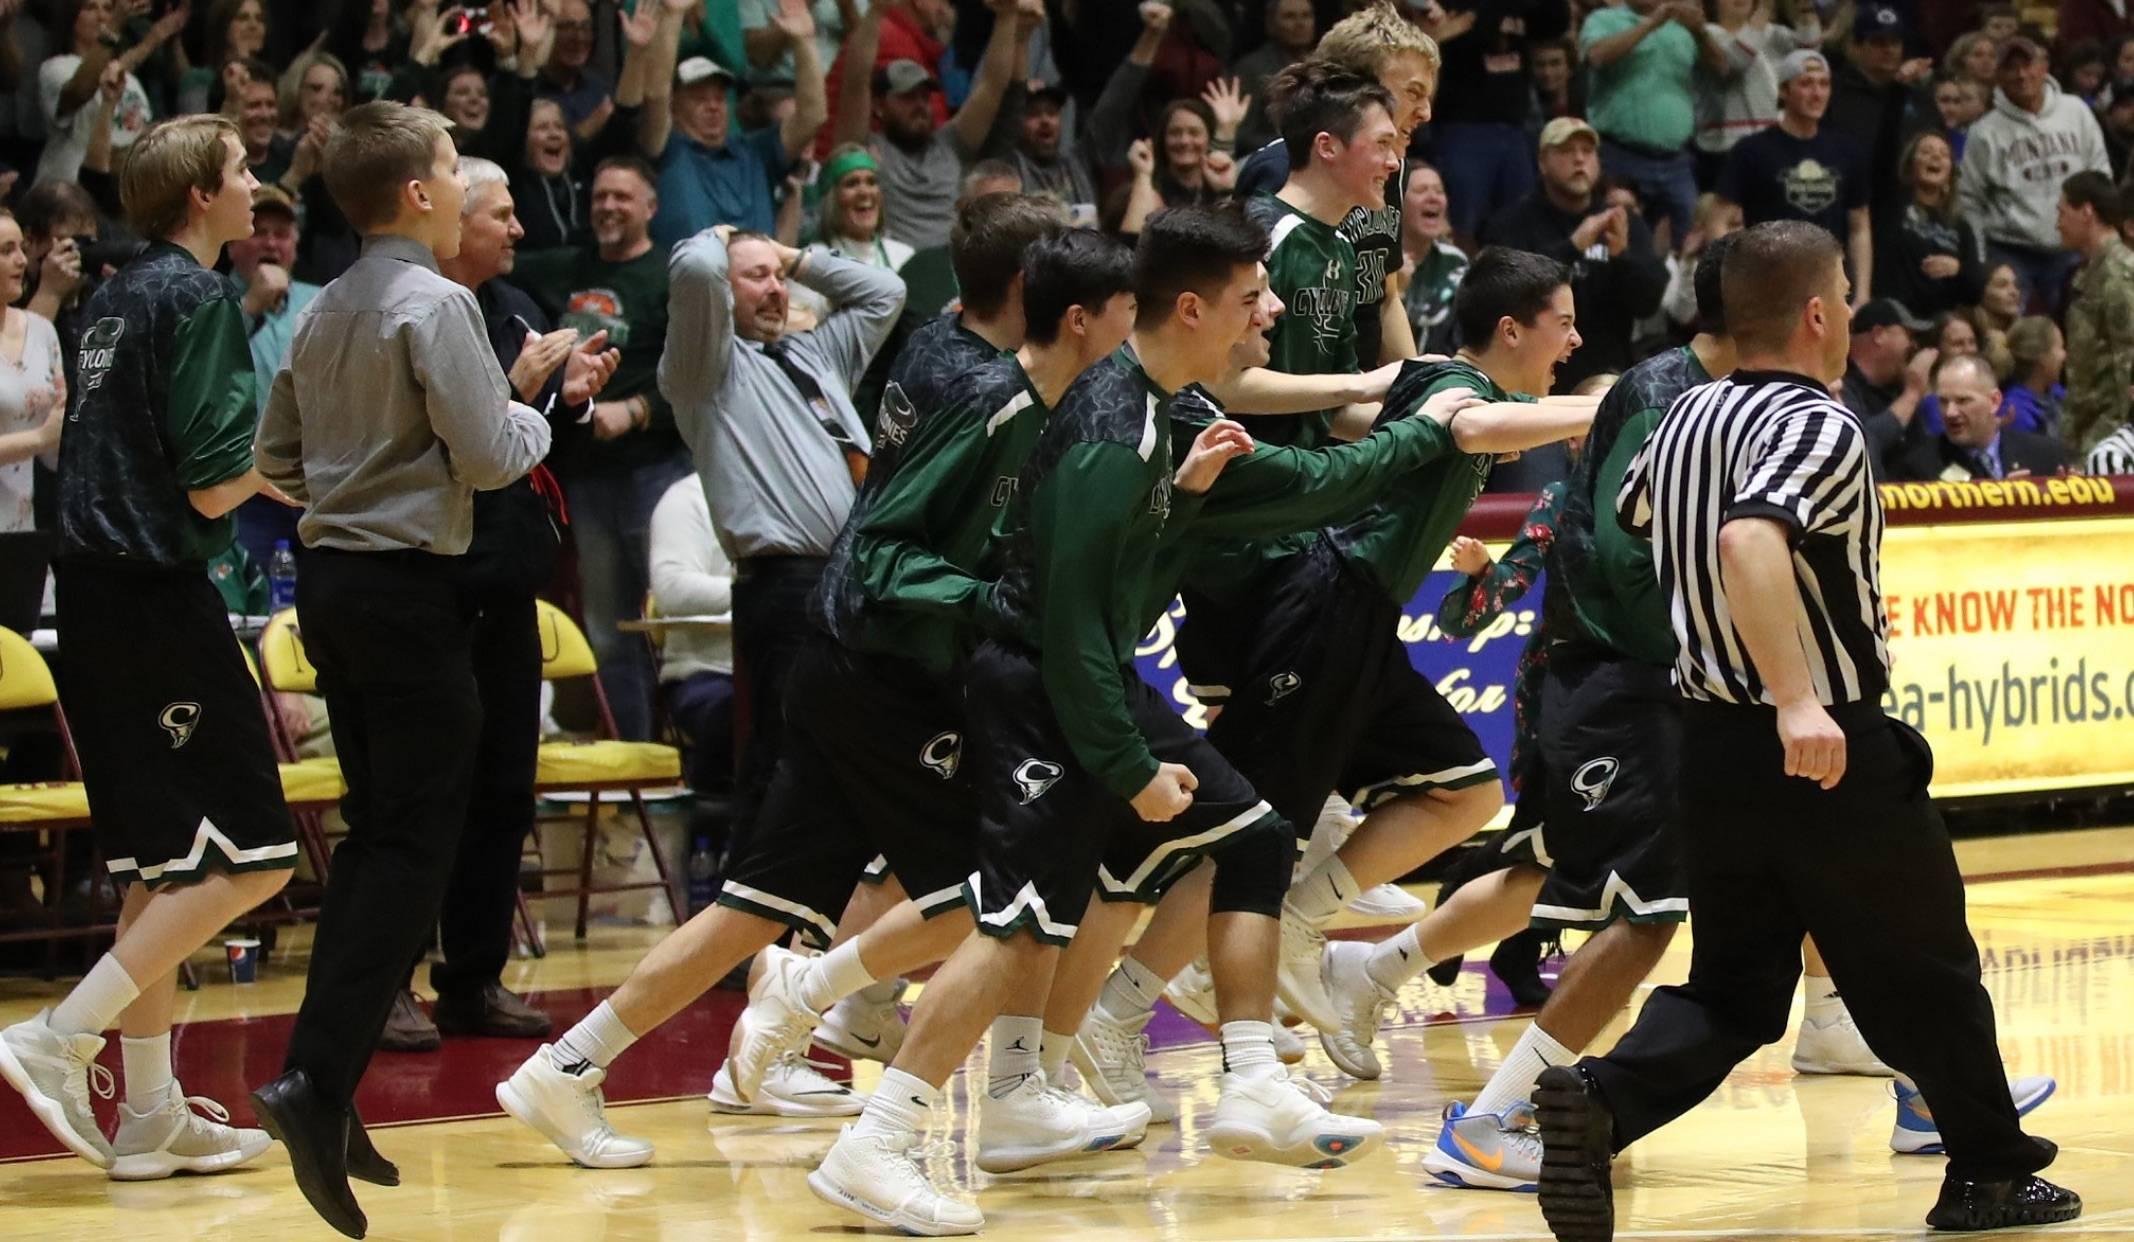 High school boys basketball team celebrating